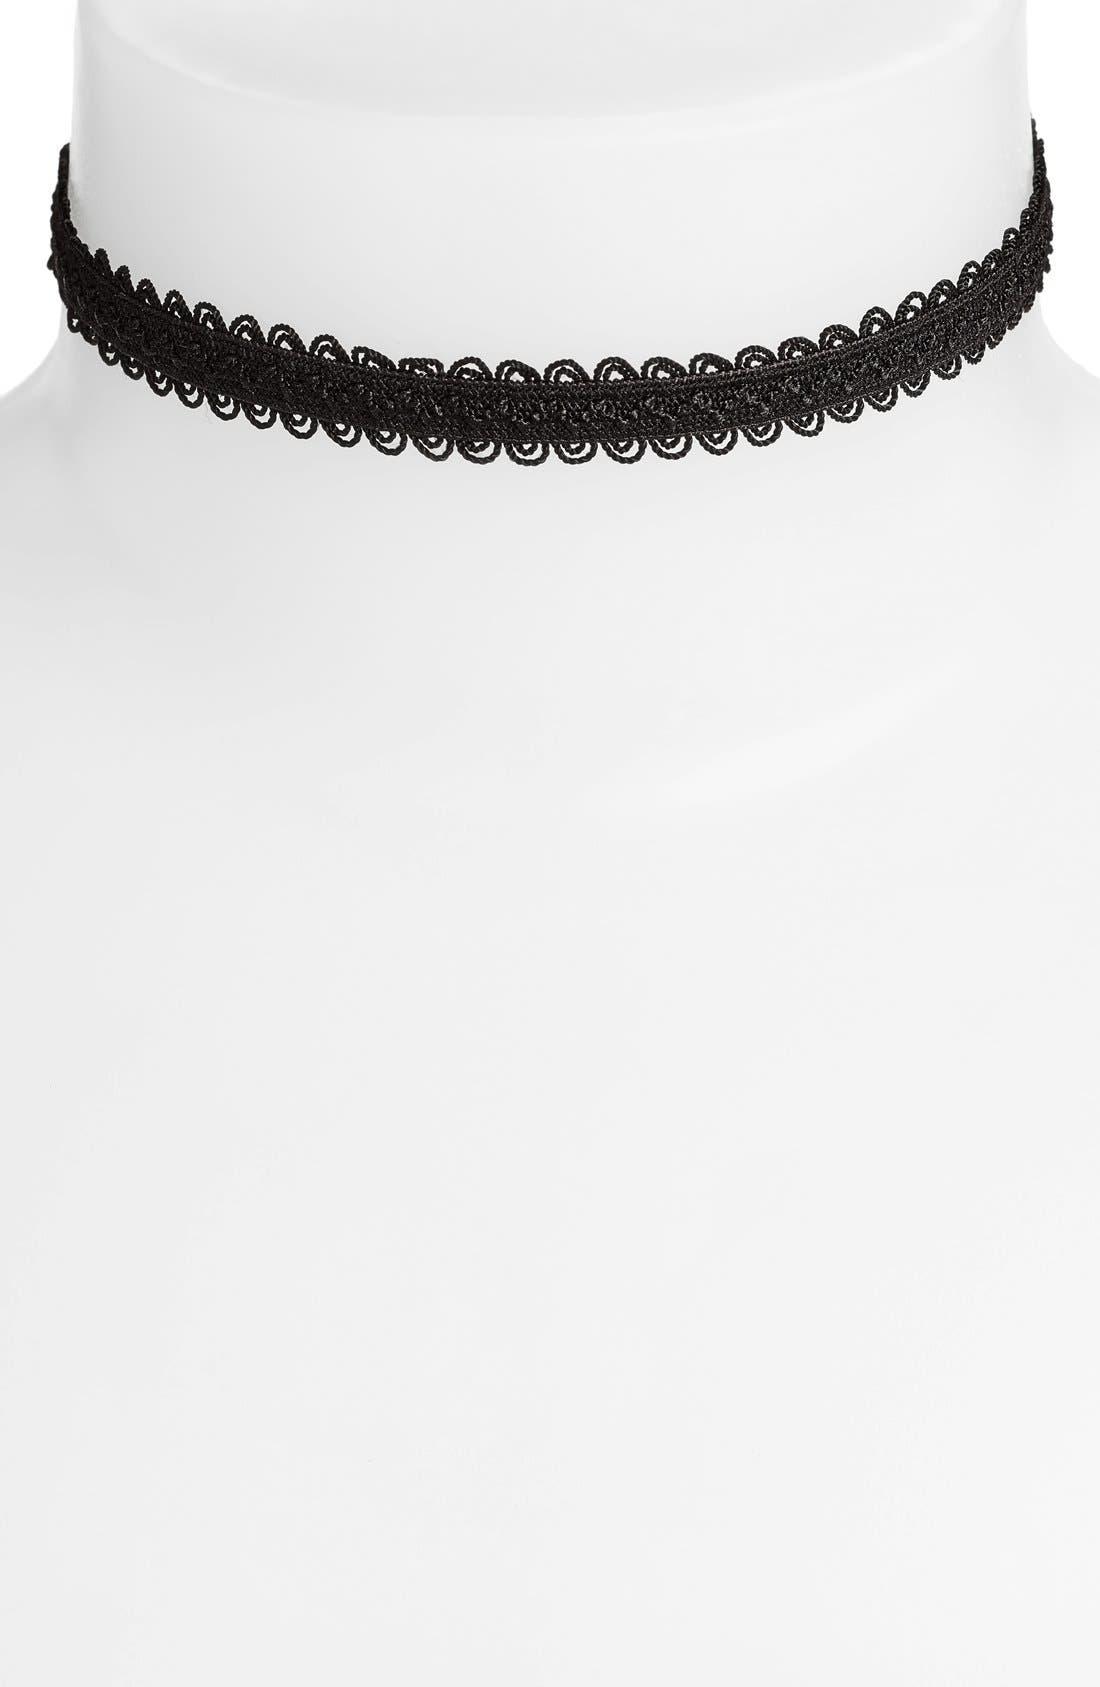 Main Image - Vanessa Mooney Black Lace Choker